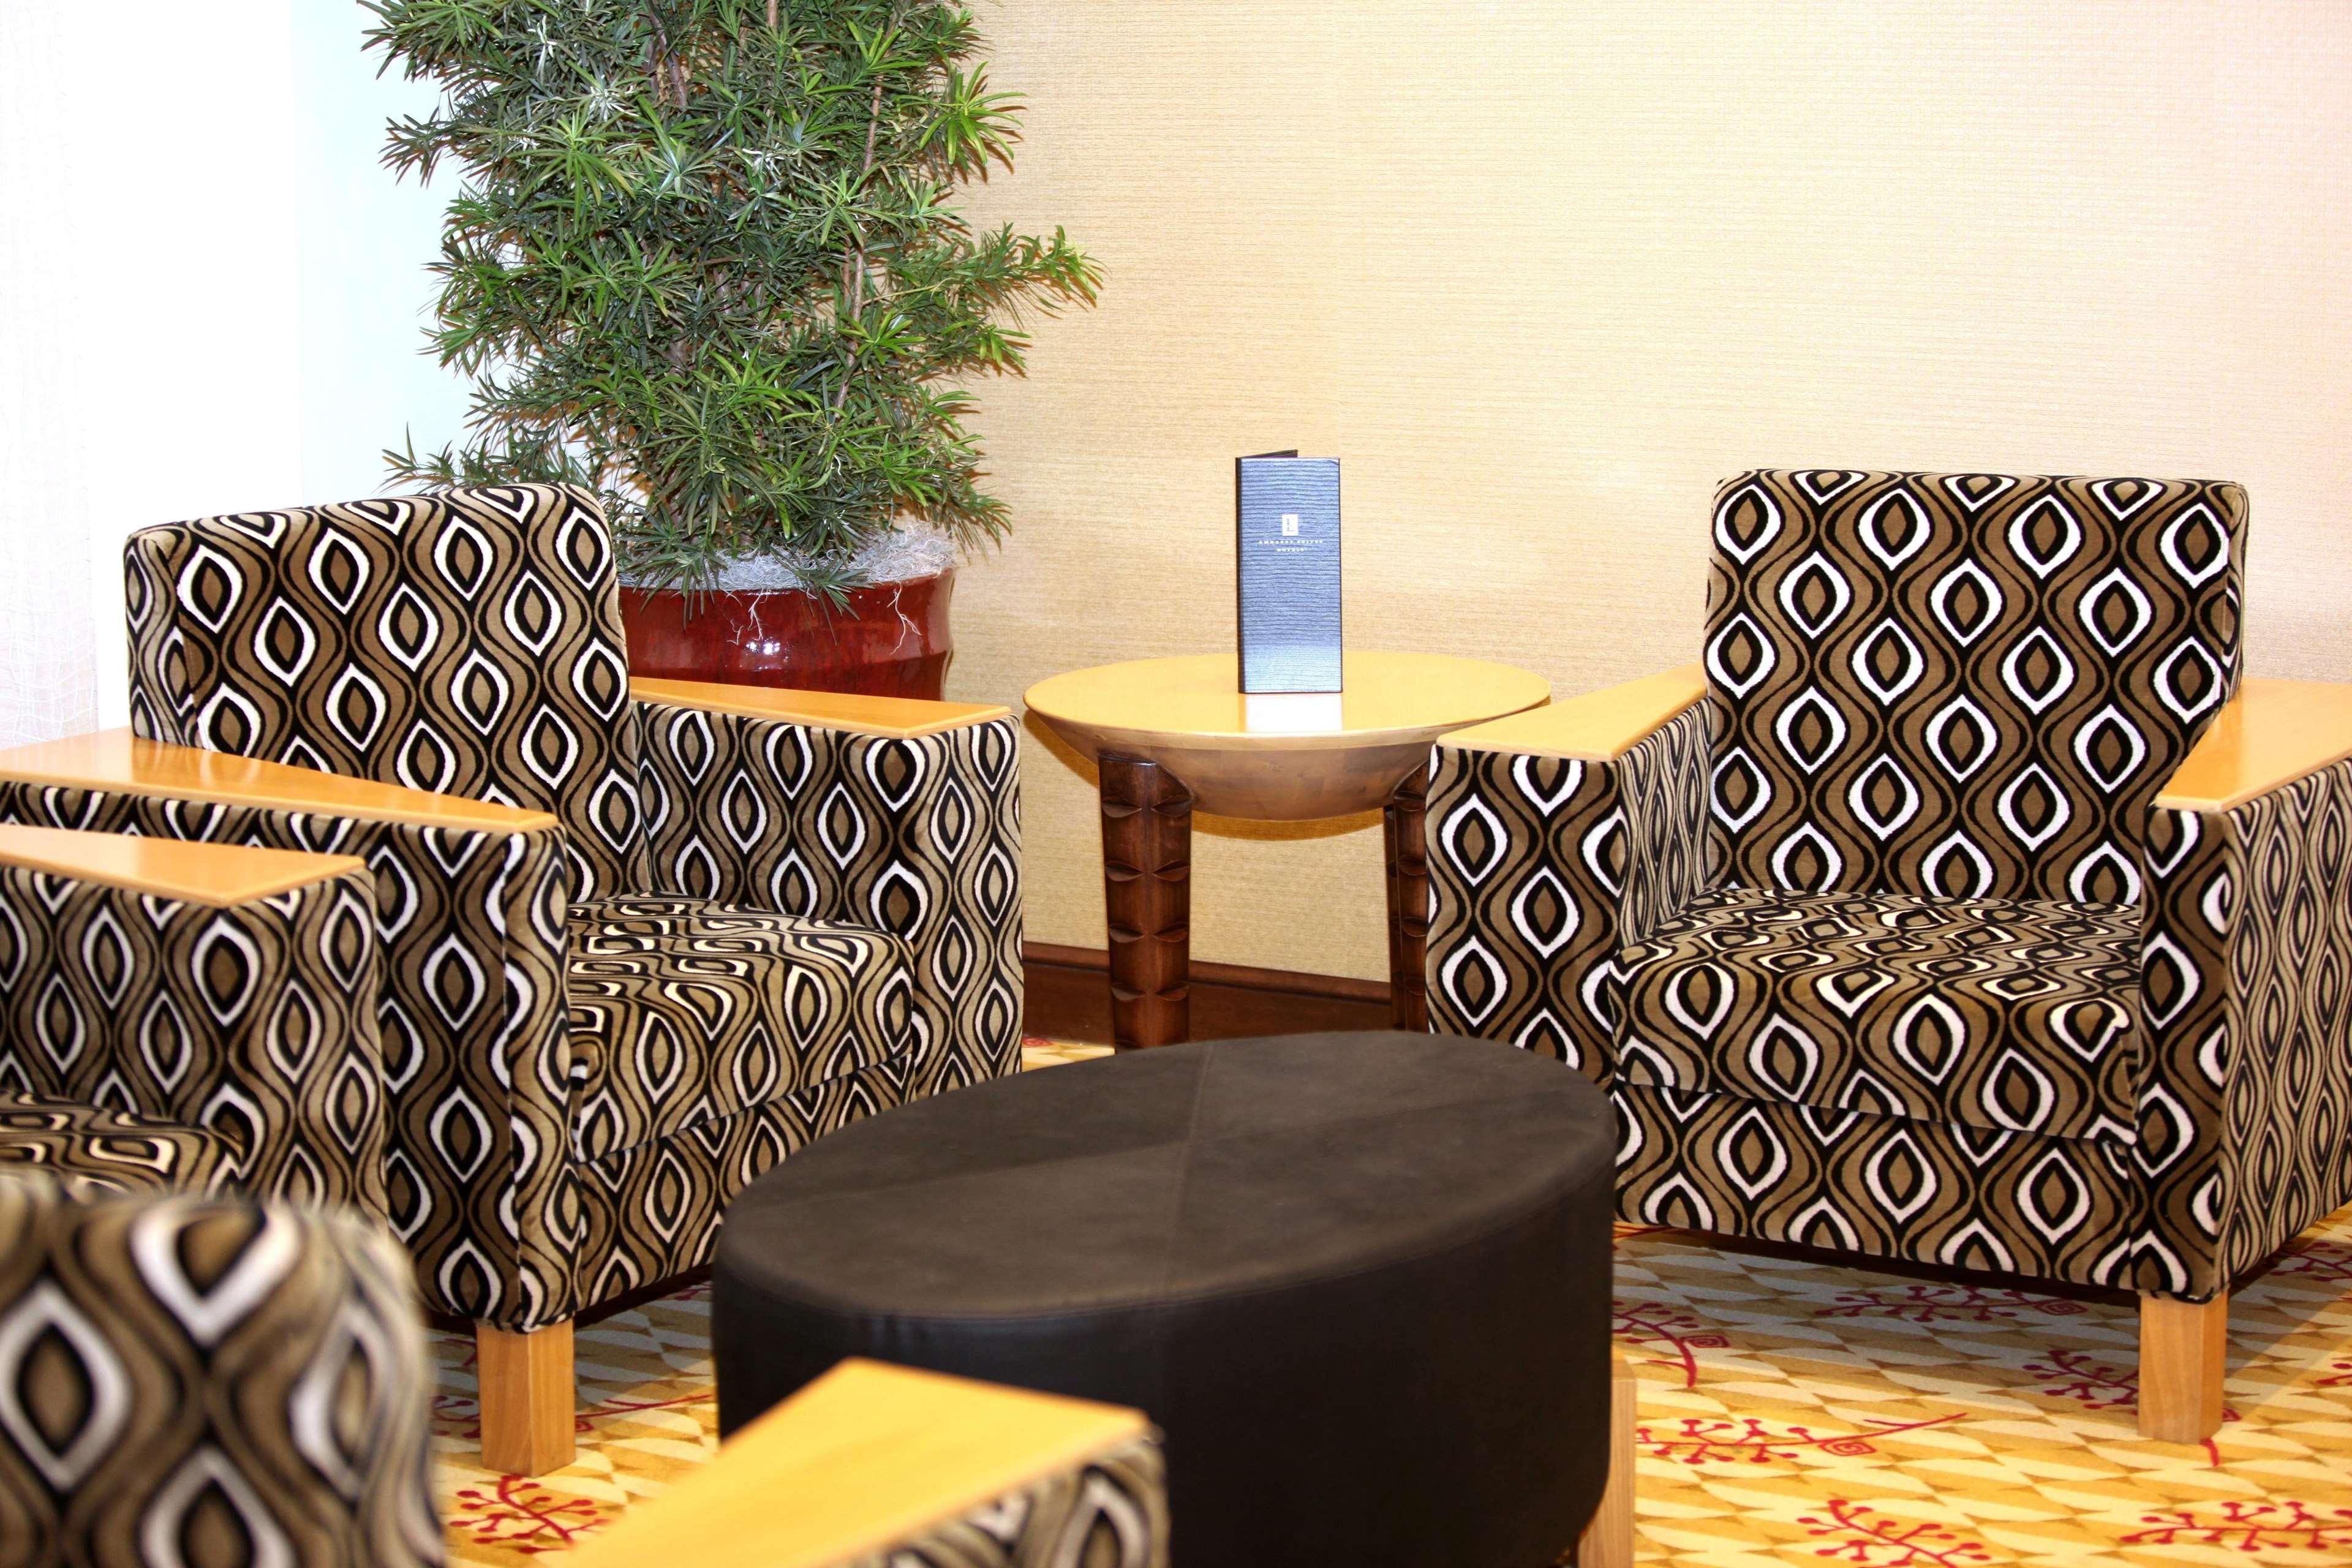 Embassy Suites by Hilton Birmingham Hoover image 5